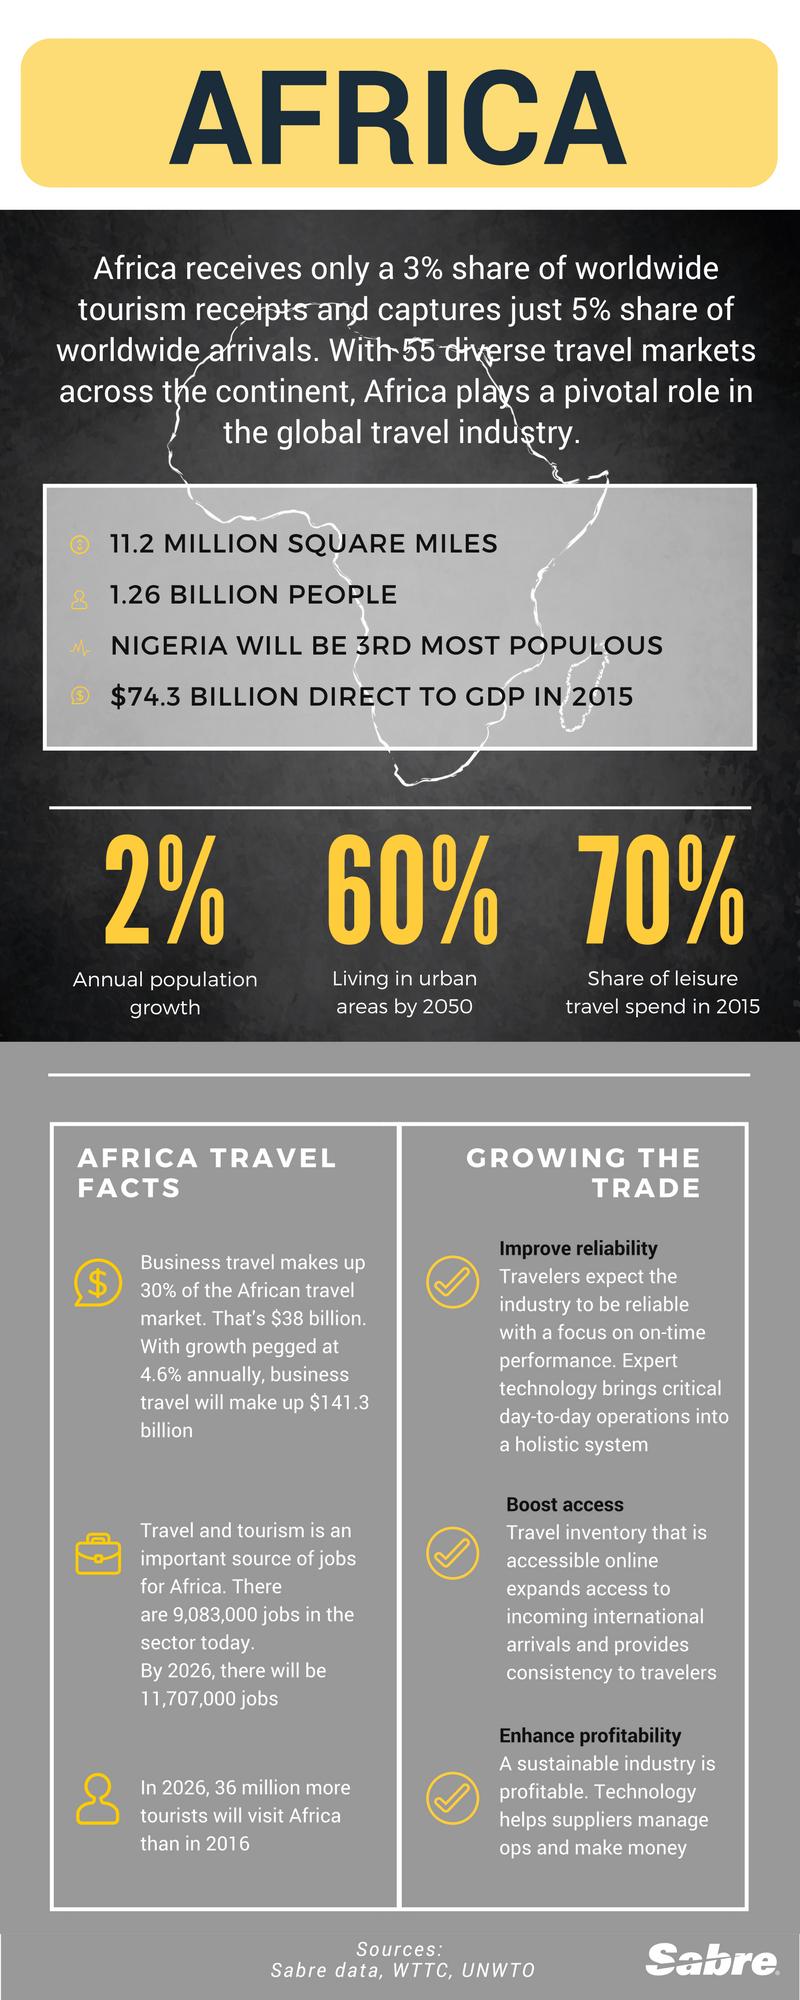 africa-infographic-for-tk-byline-5